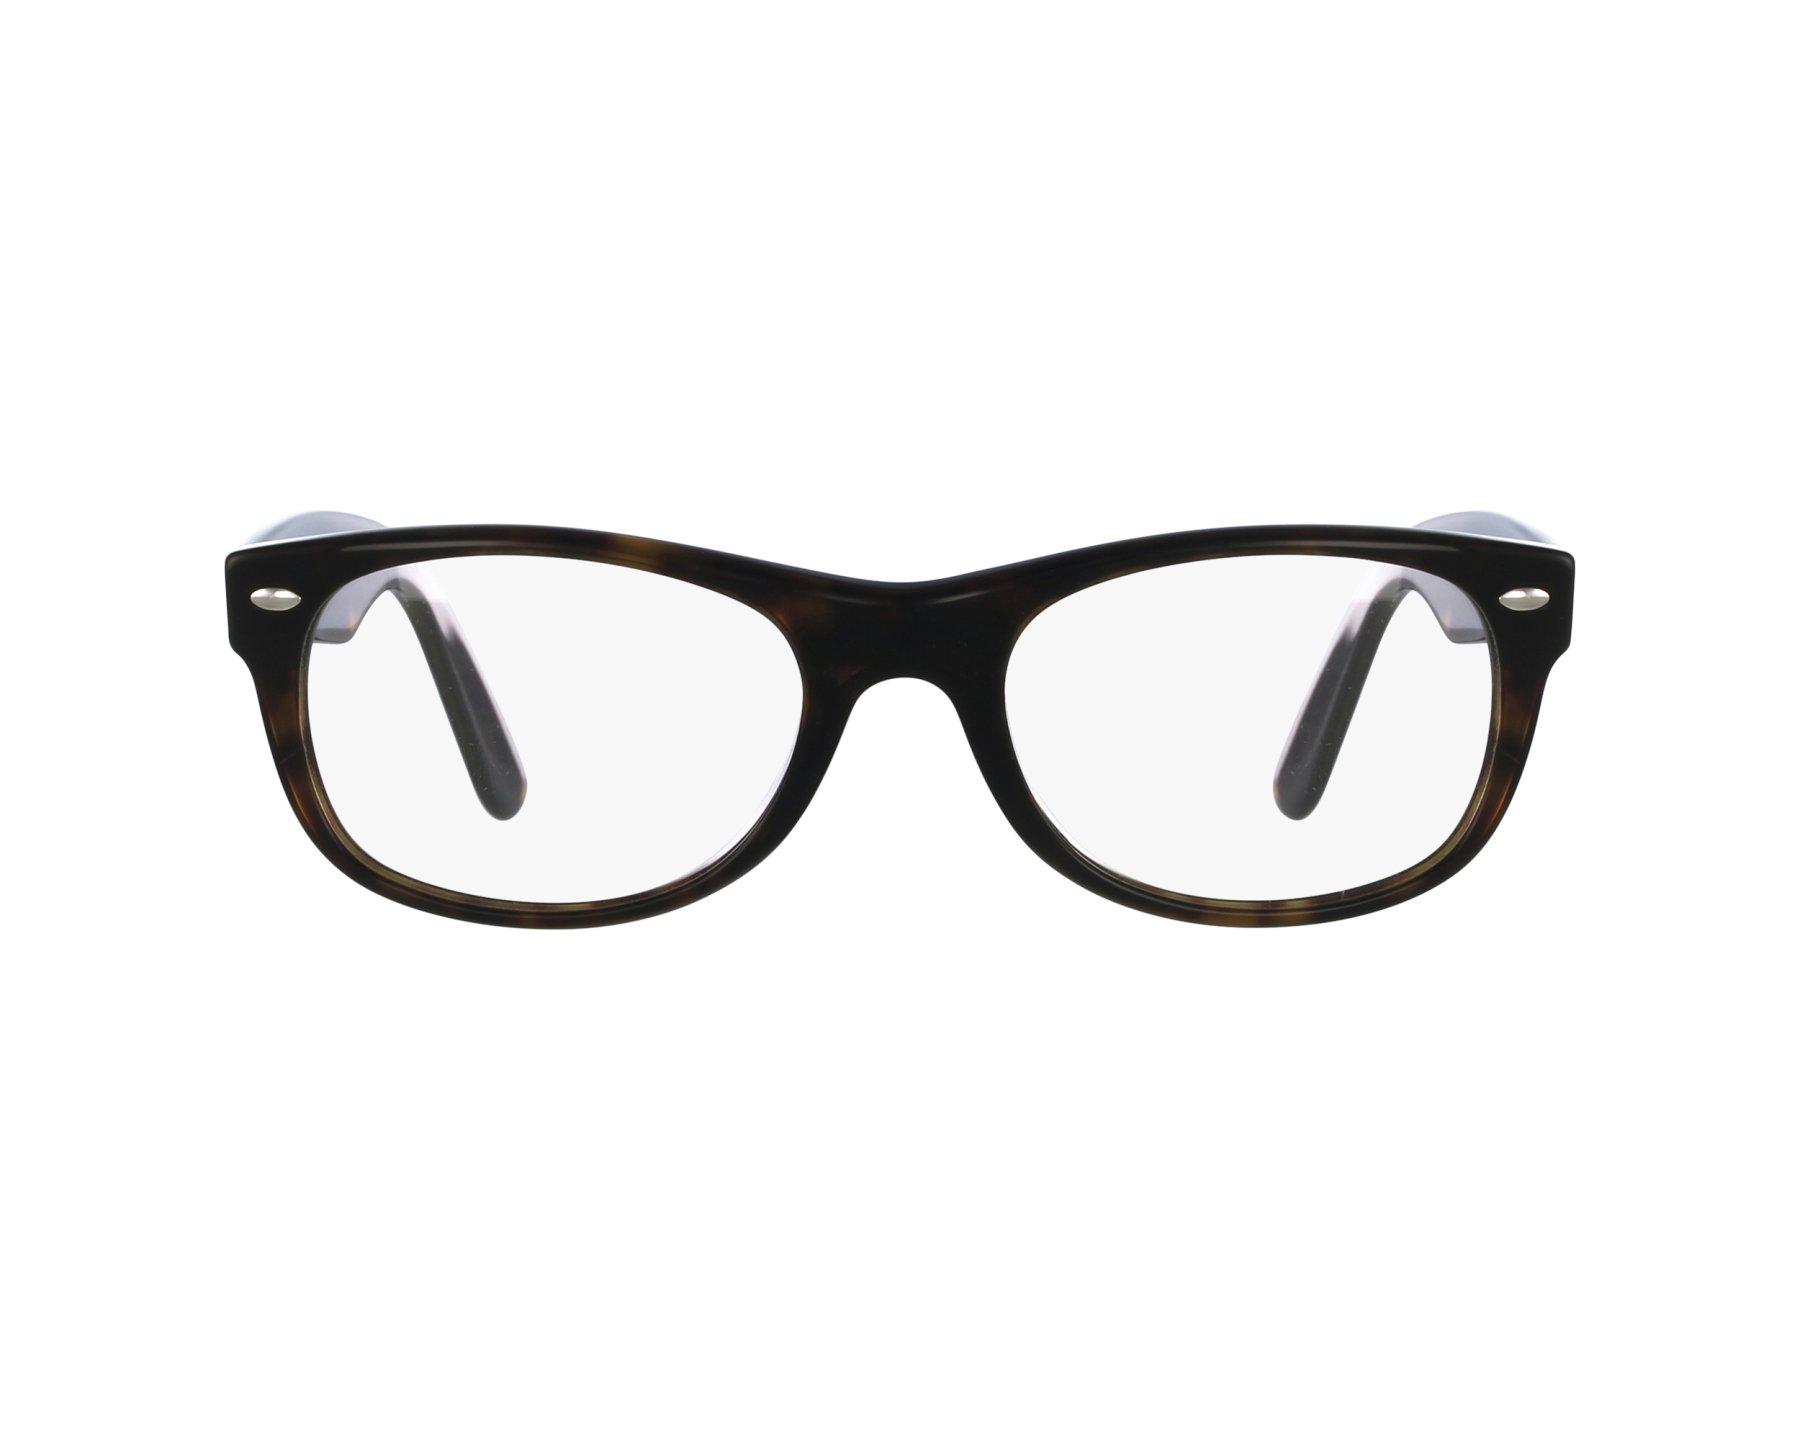 lunettes de vue ray ban collection 2012. Black Bedroom Furniture Sets. Home Design Ideas